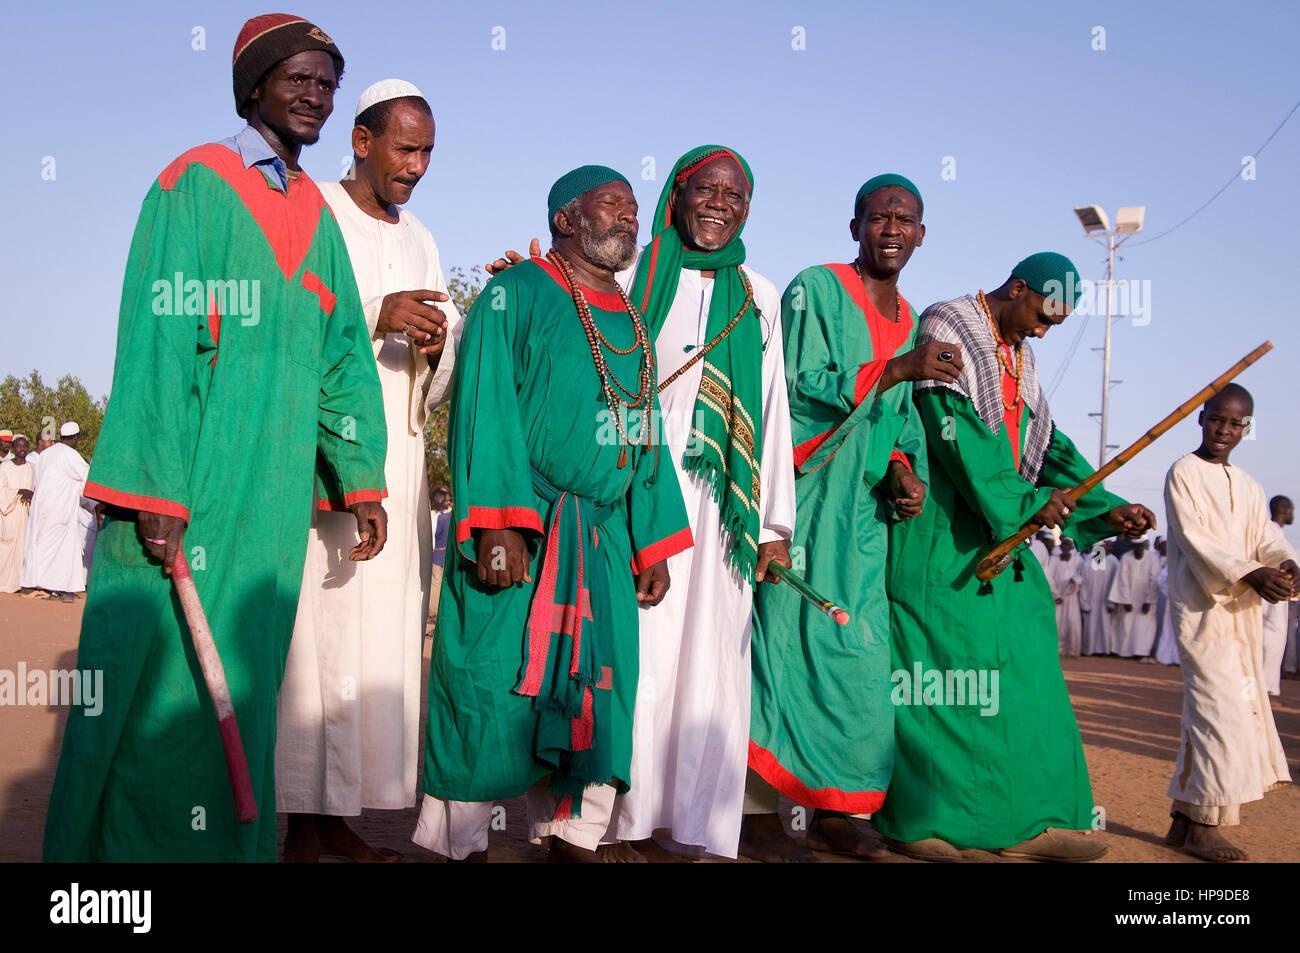 SUDAN, OMDURMAN: Every Friday the sufis of Omdurman, the other half of Northern Sudan's capital Khartoum, gather - Stock Image